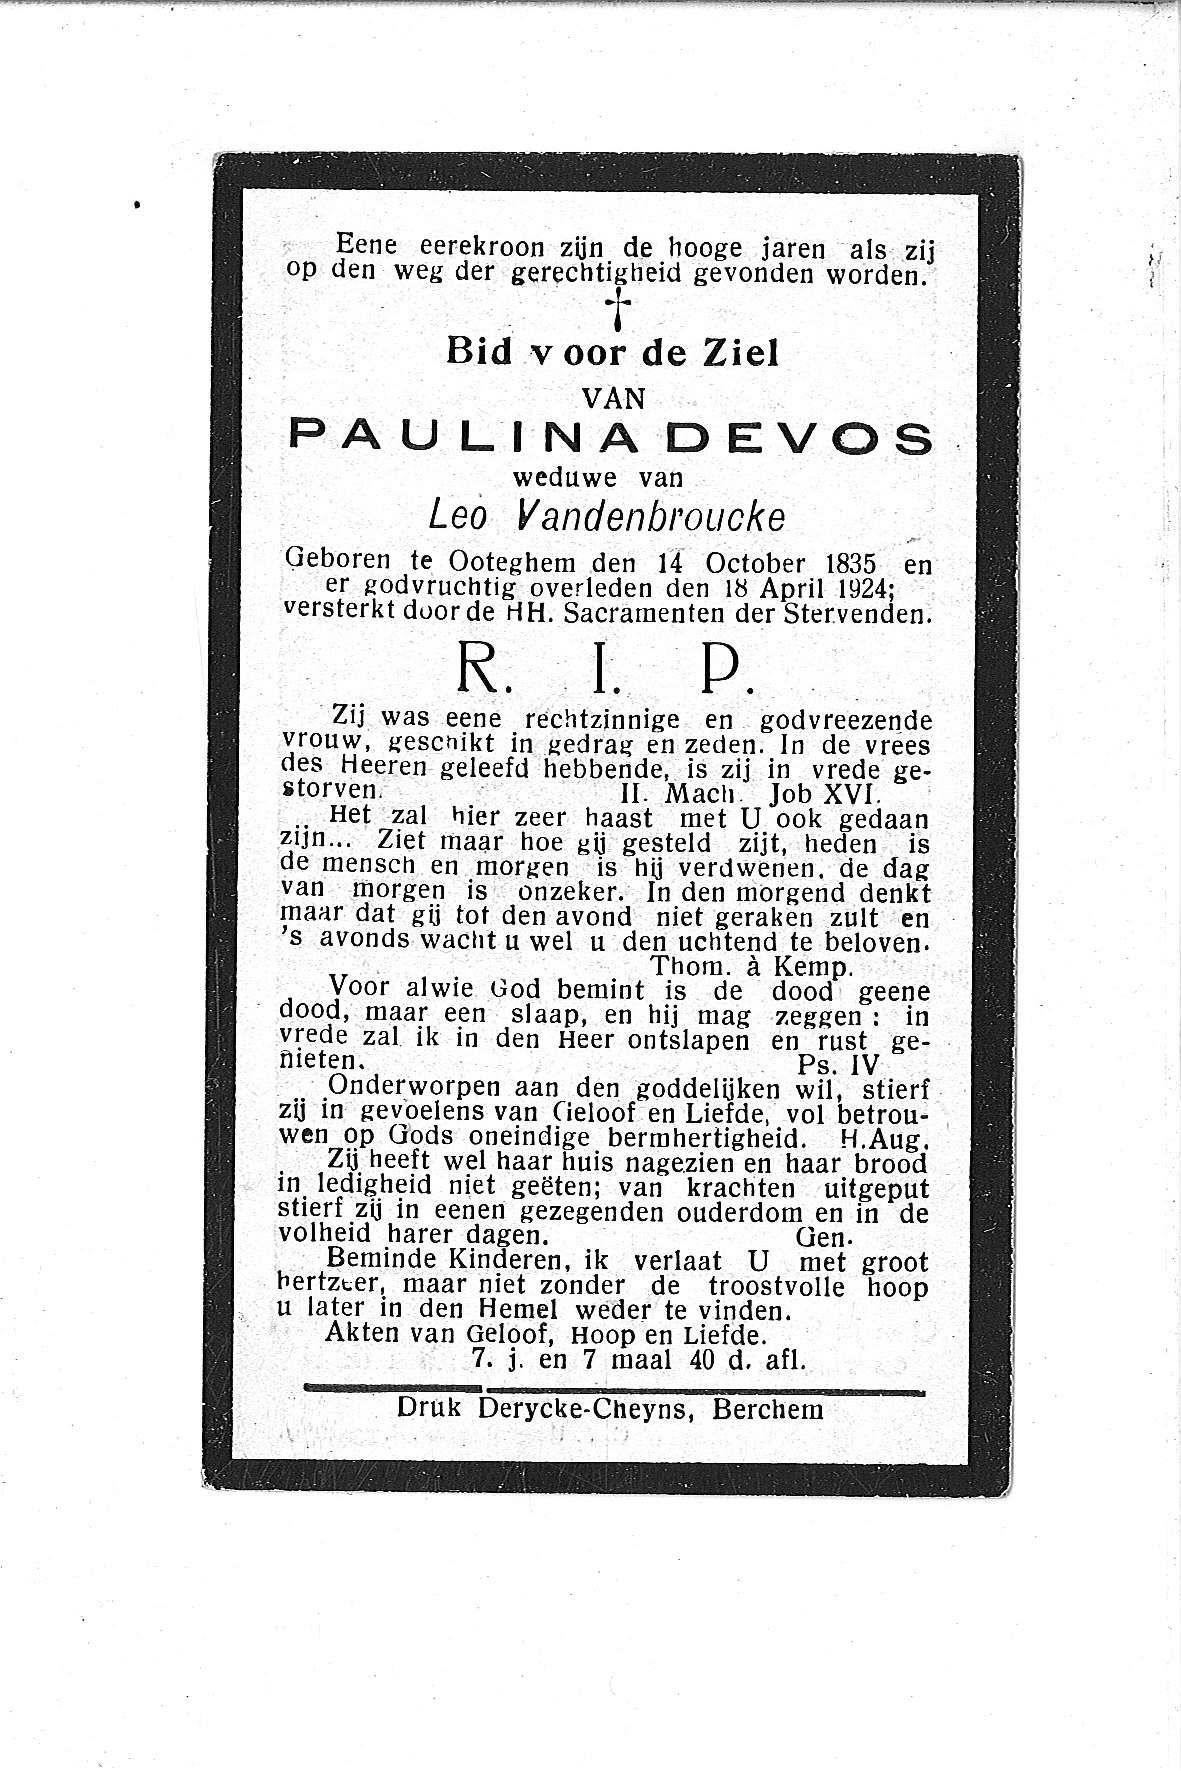 Paulina (1924) 20120306142406_00271.jpg